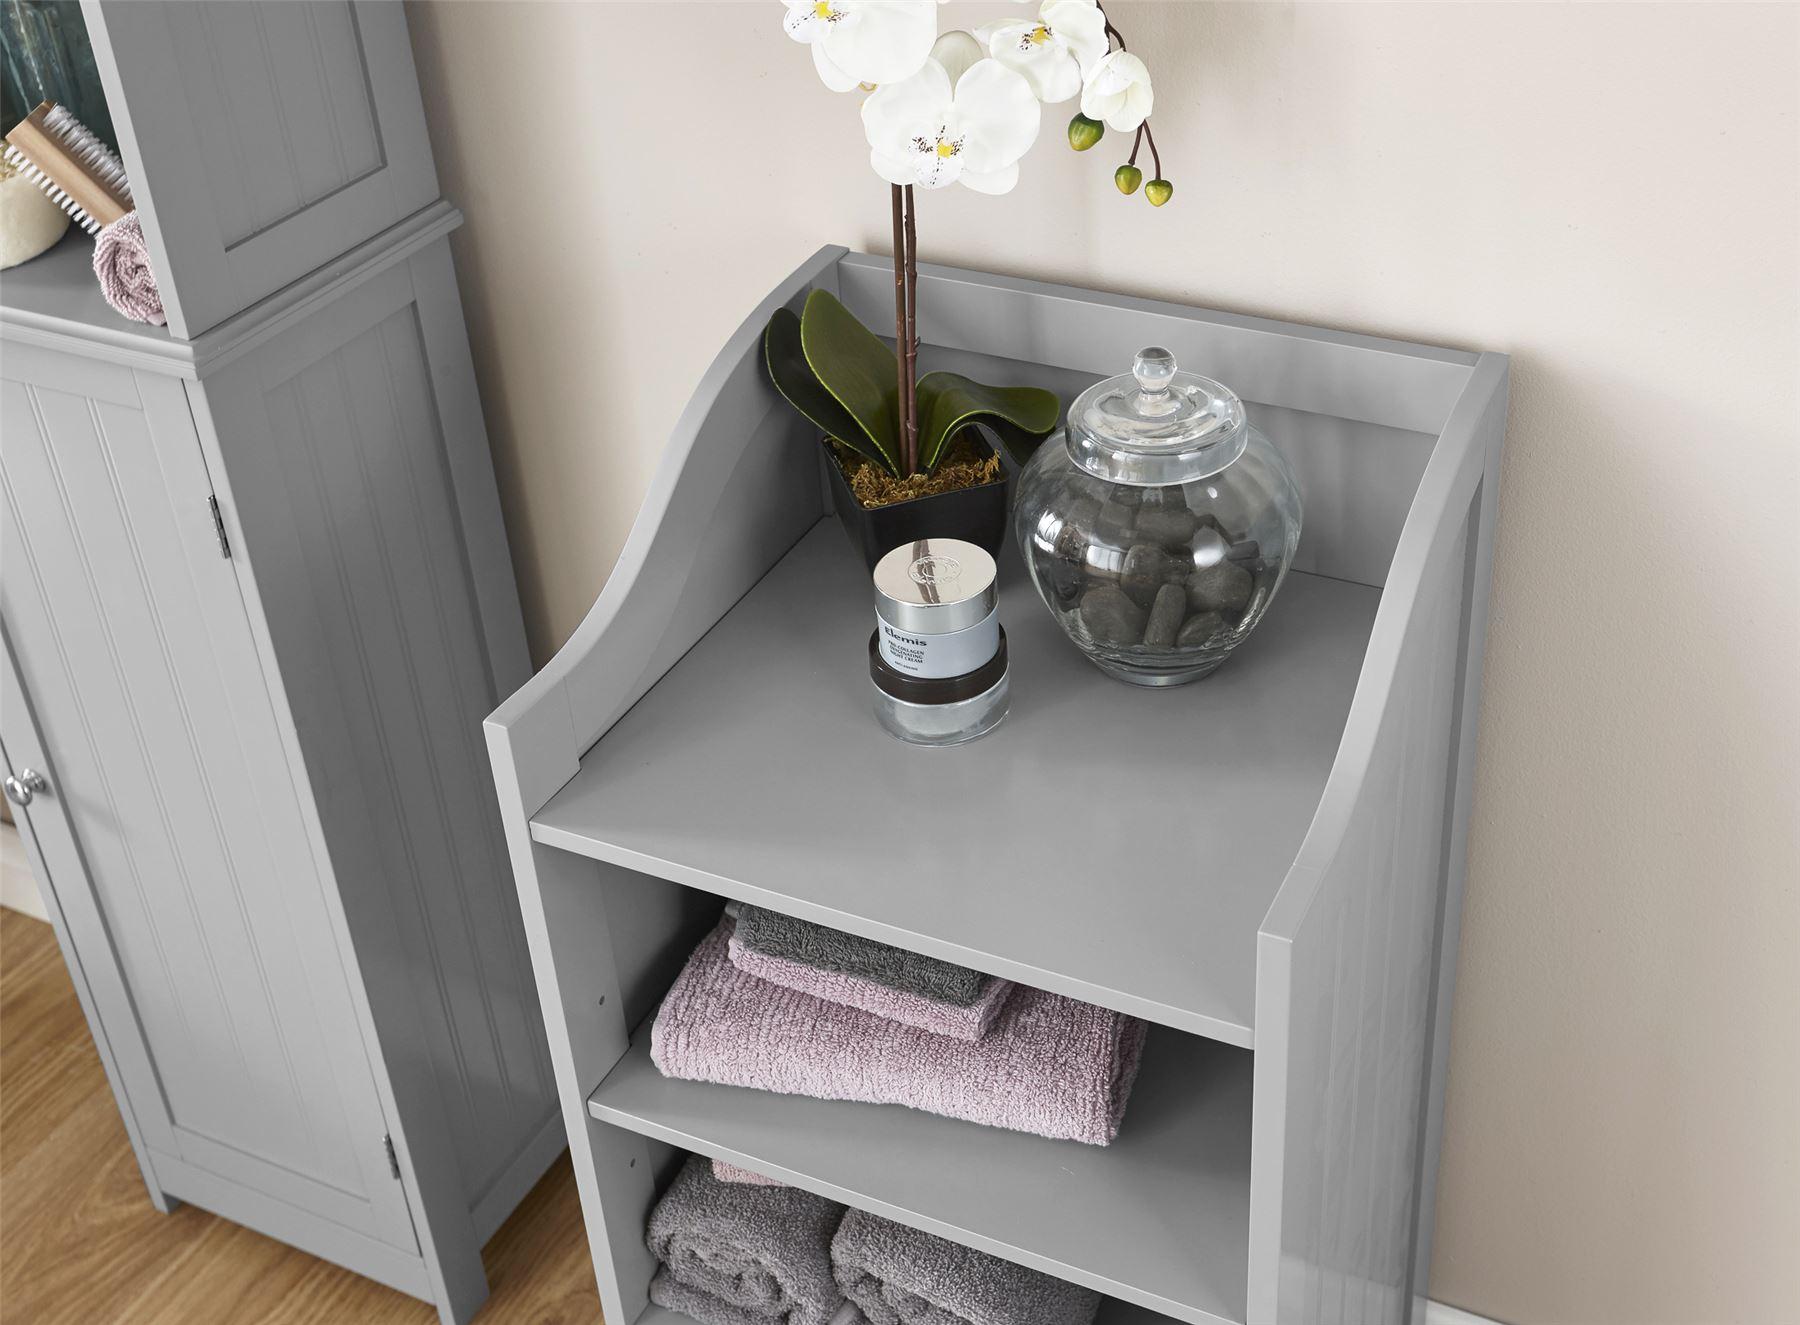 White Bathroom Furniture Cabinet Shelving Laundry Bin Mirror Door Medicine Sink: COLONIAL RANGE BATHROOM FURNITURE CUPBOARD SHELF UNDER